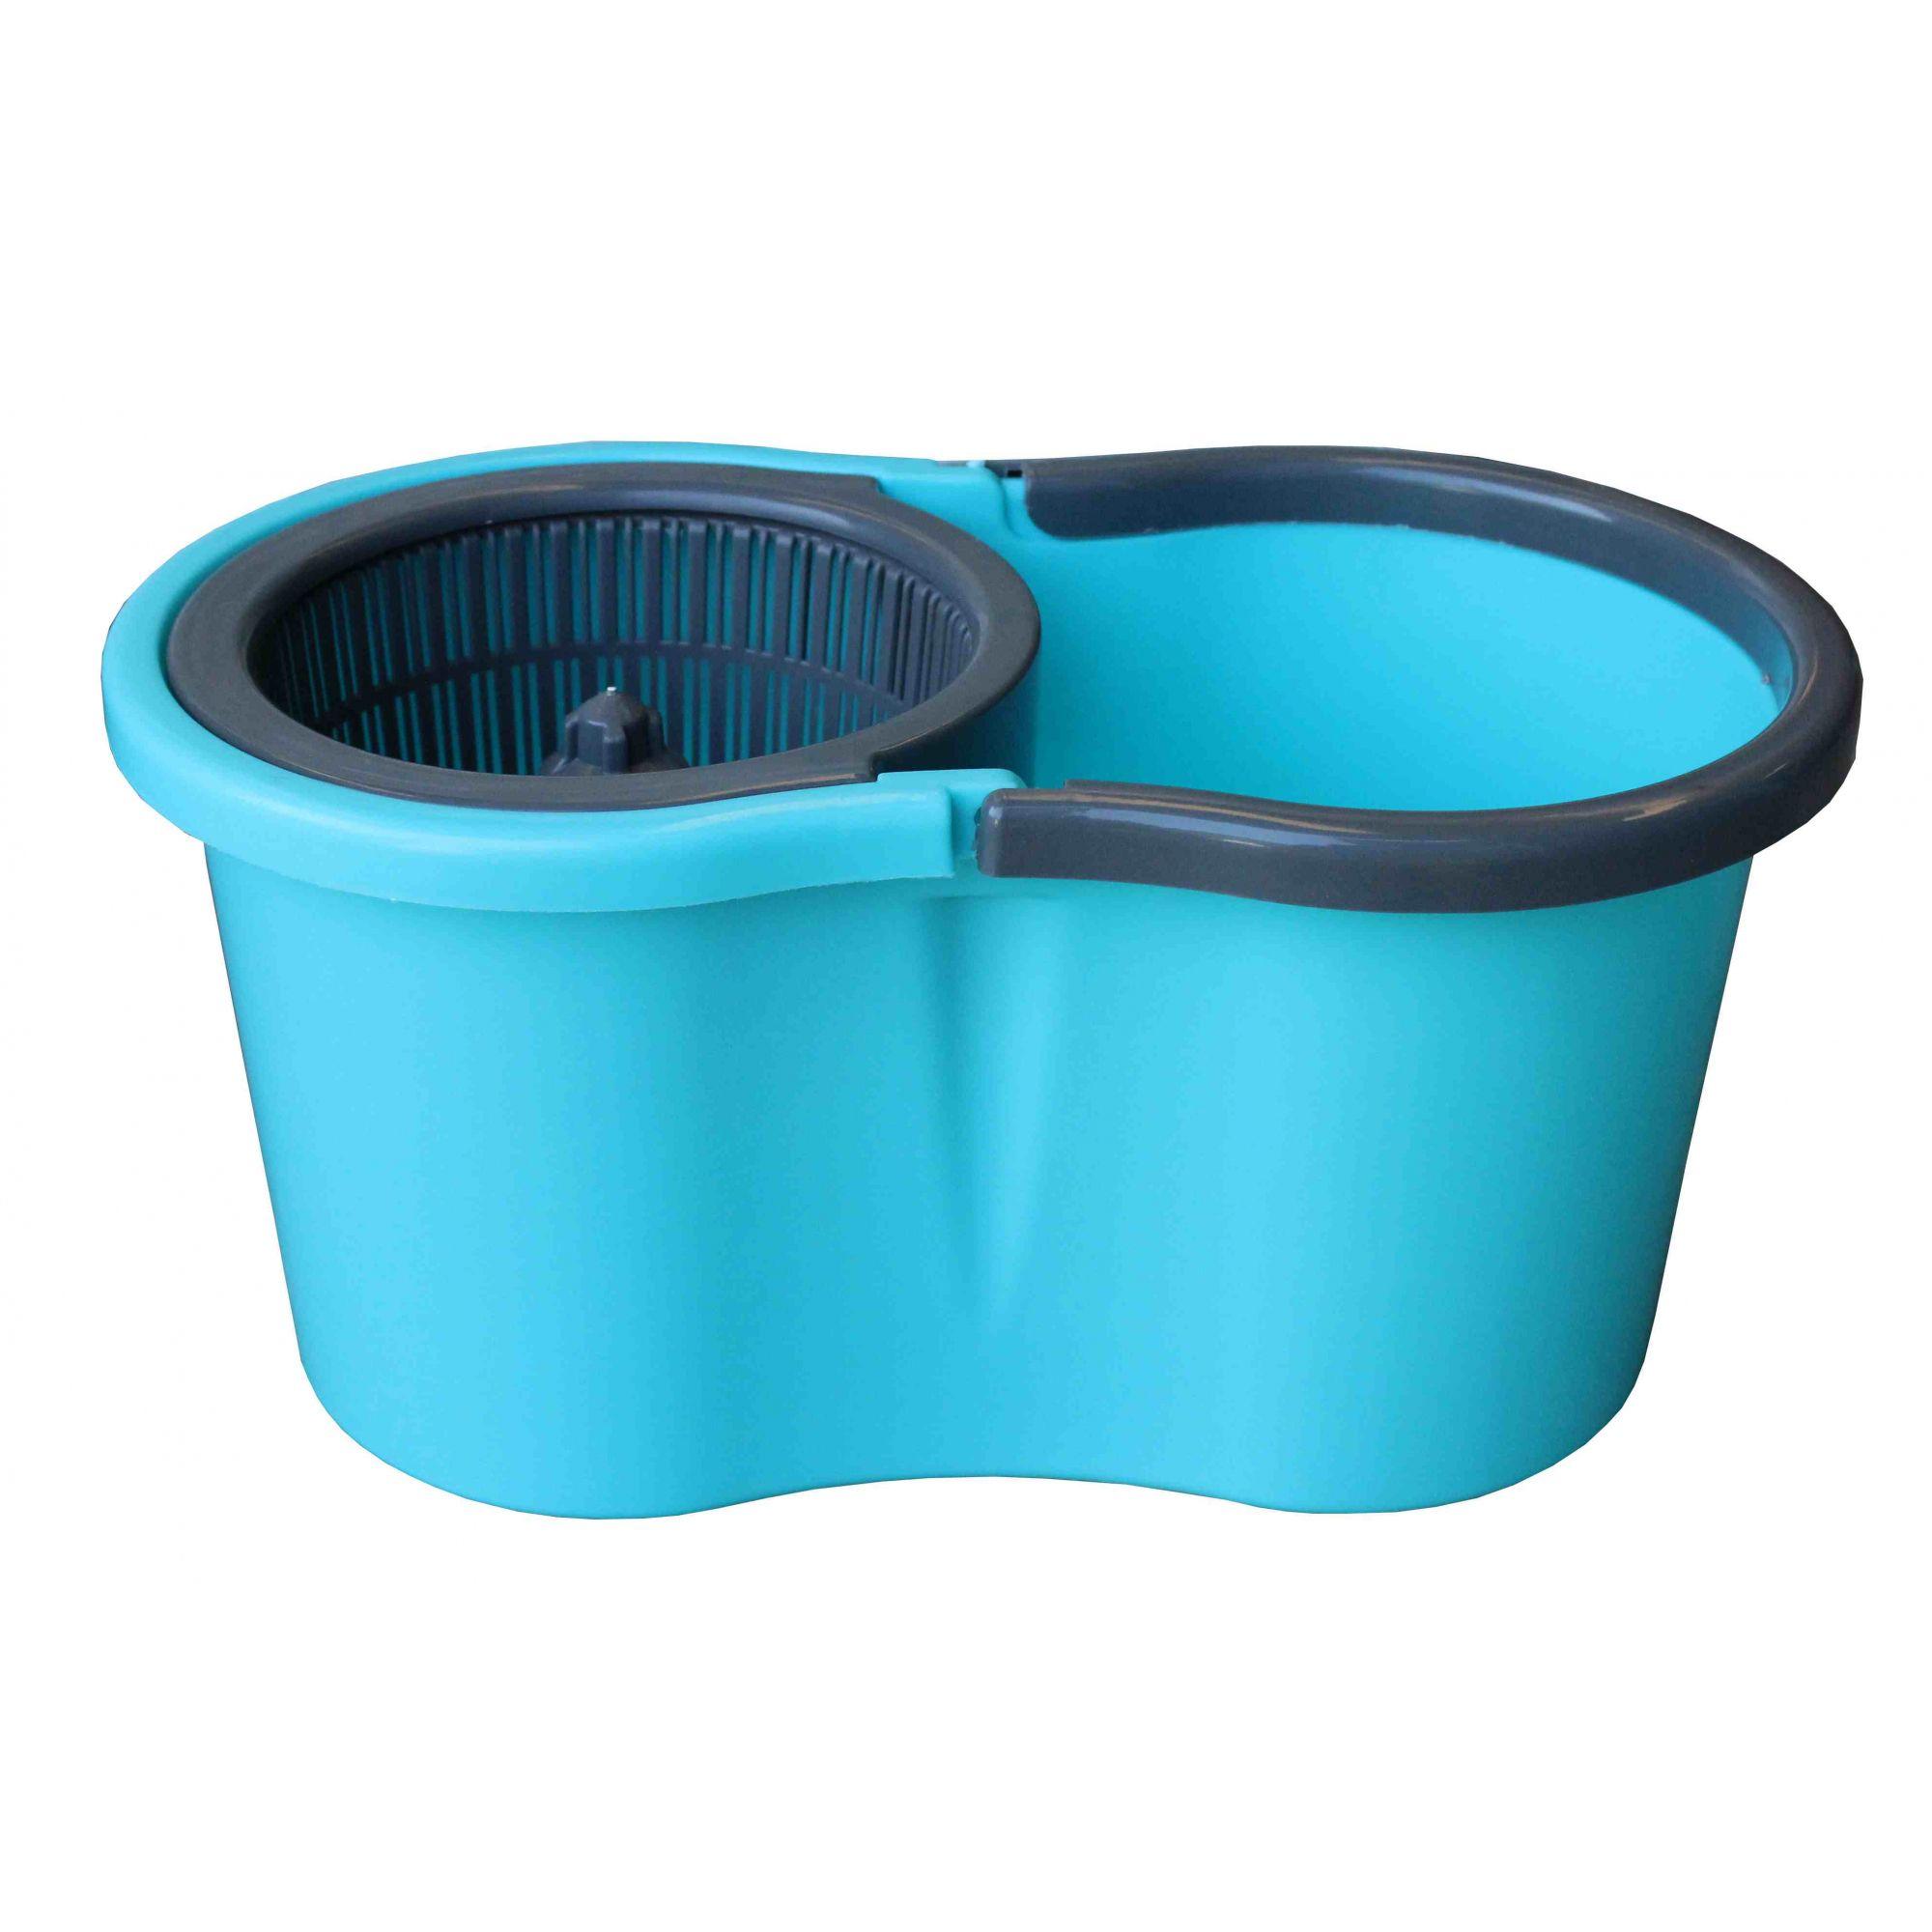 Esfregão MOP Premium Centrífuga Azul Turquesa Mundi